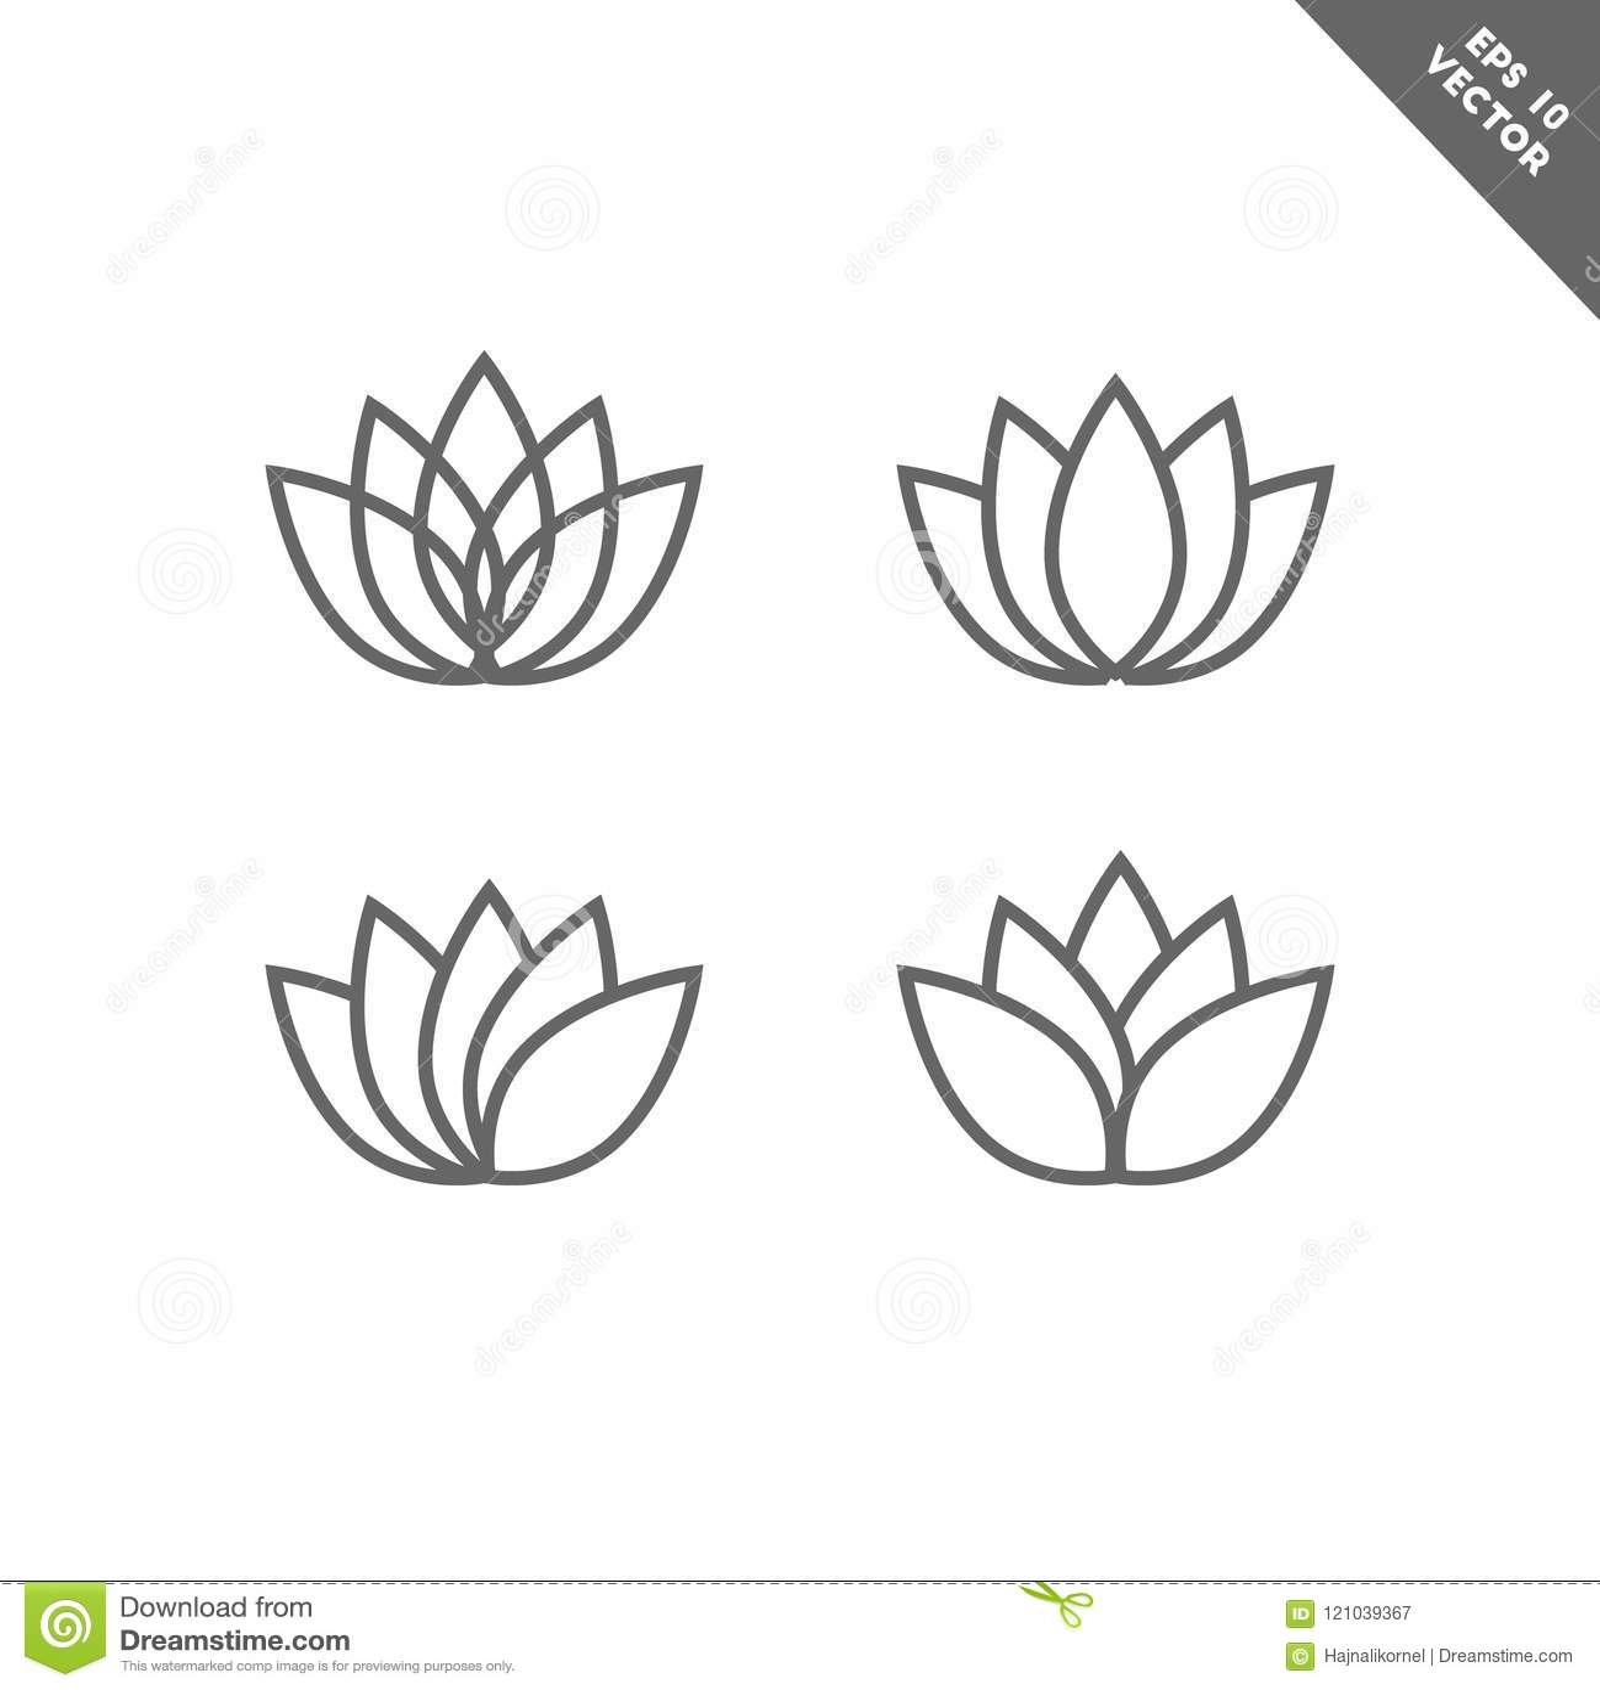 Lotus Flower Icon Set In Line Art Stock Vector Illustration Of